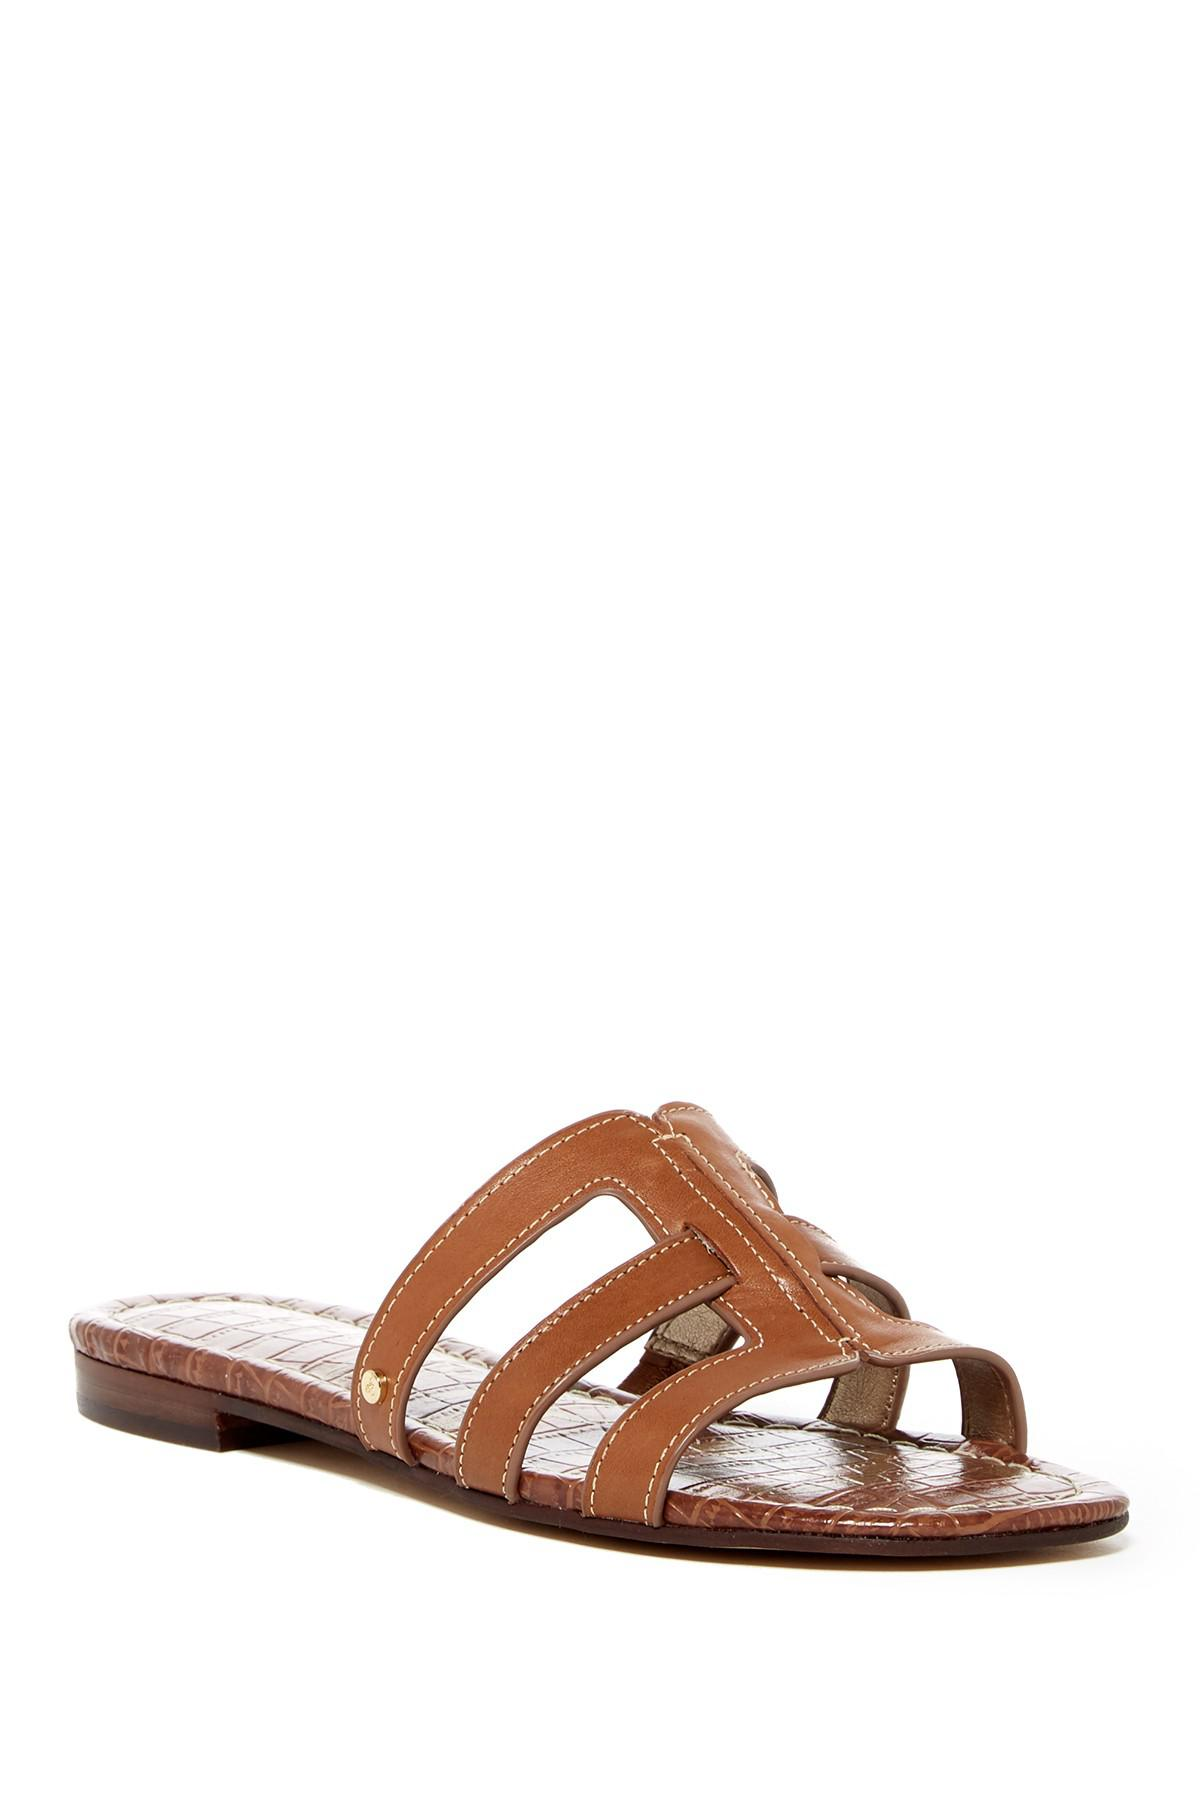 Sam Edelman. Women's Brown Berit Slide Sandals